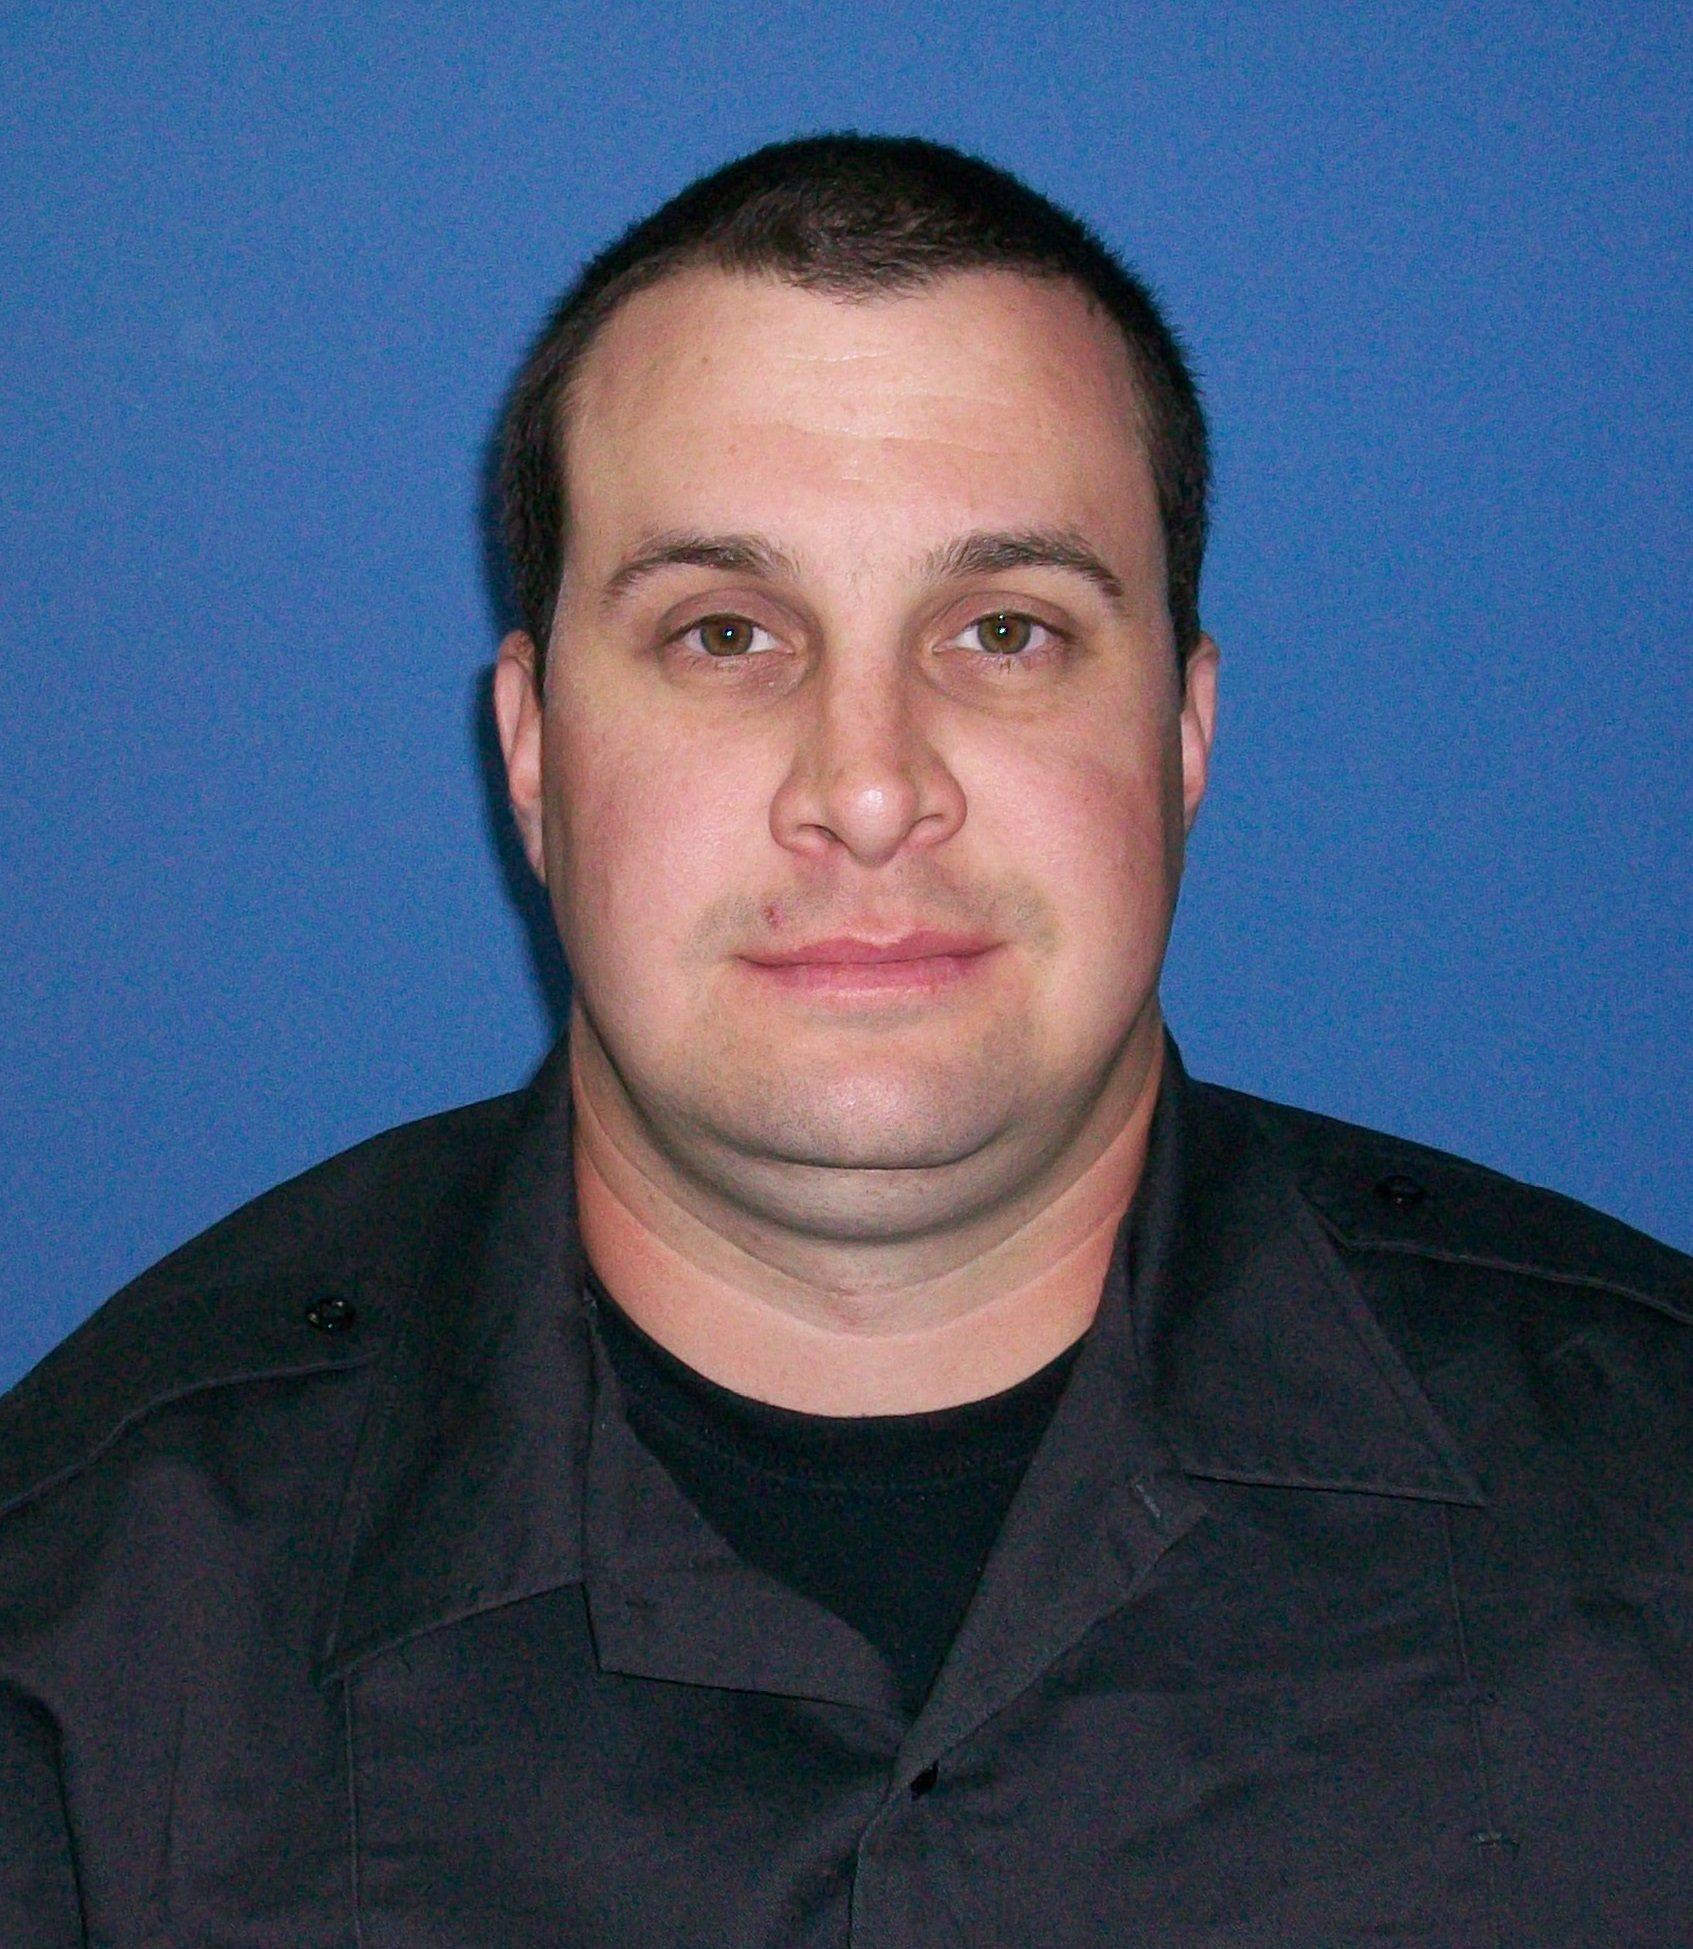 Patrolman Roger Eubanks